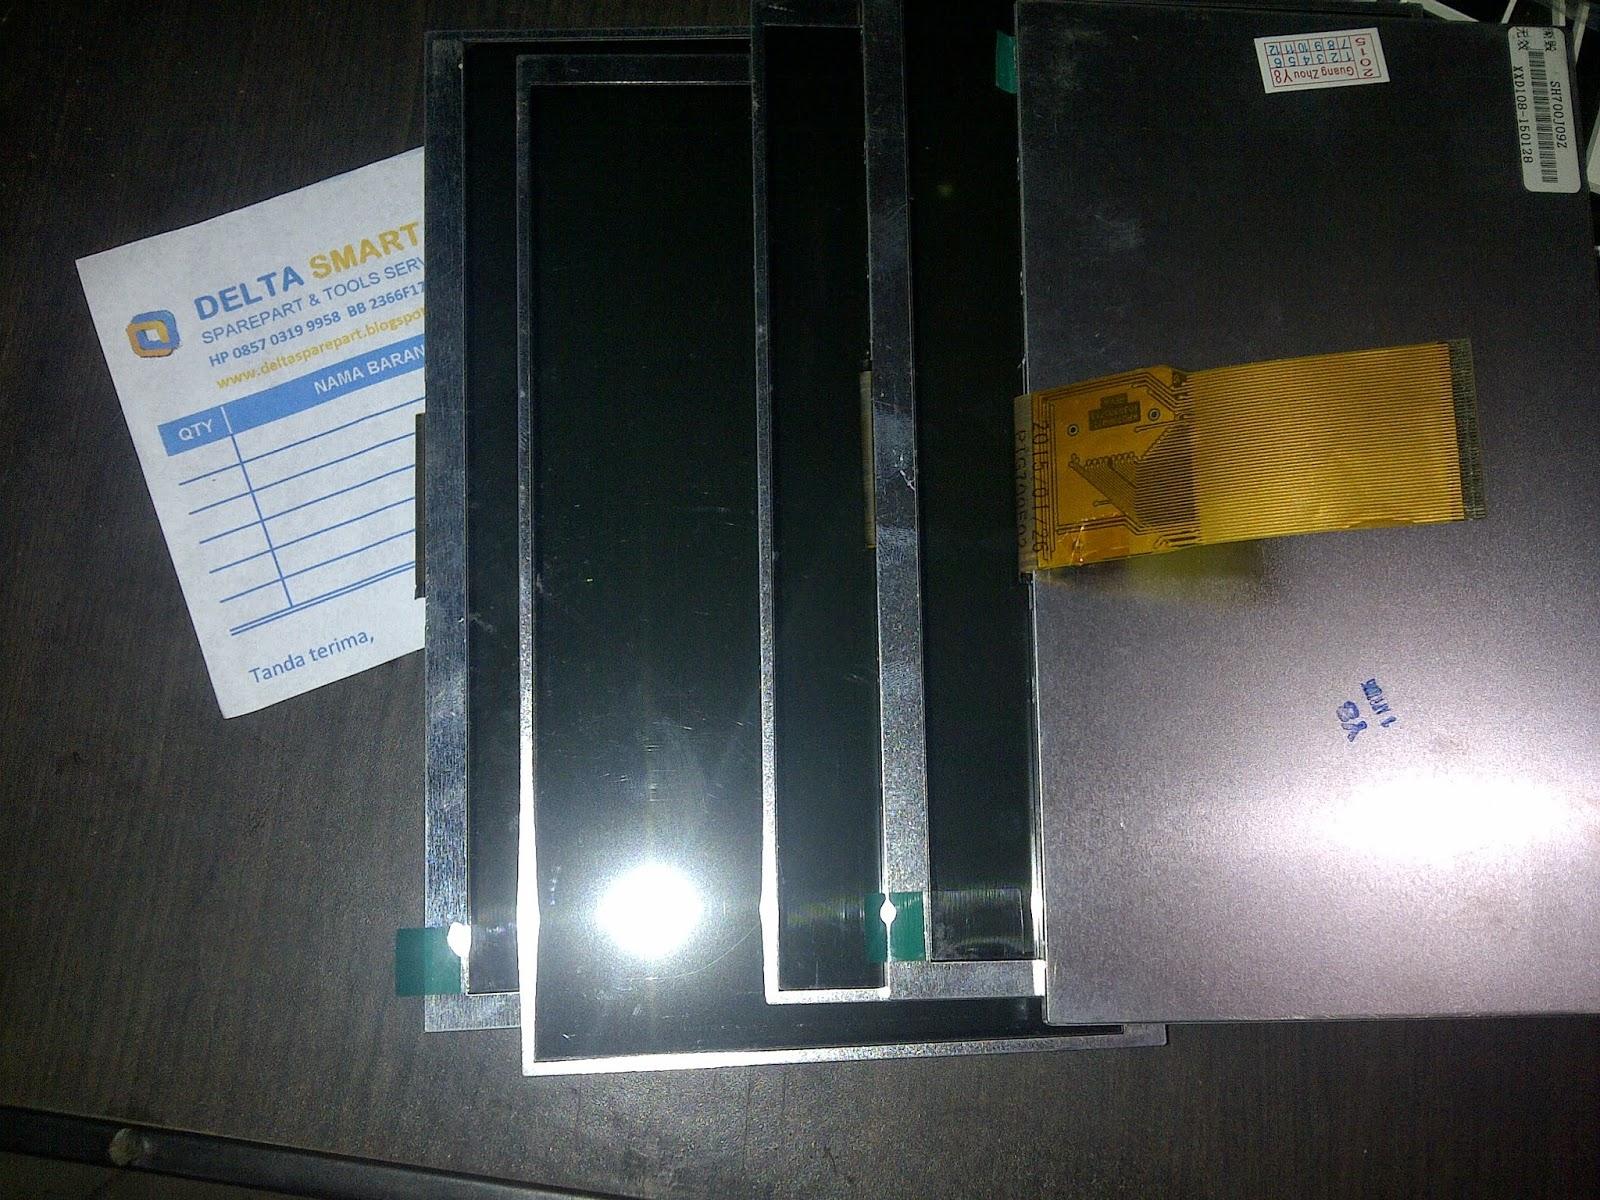 Flexcable Cina Distributor Sparepart Hp Pusat Grosir Plug In Smartfreen Andormax C Ad686g Bb 9220 9320